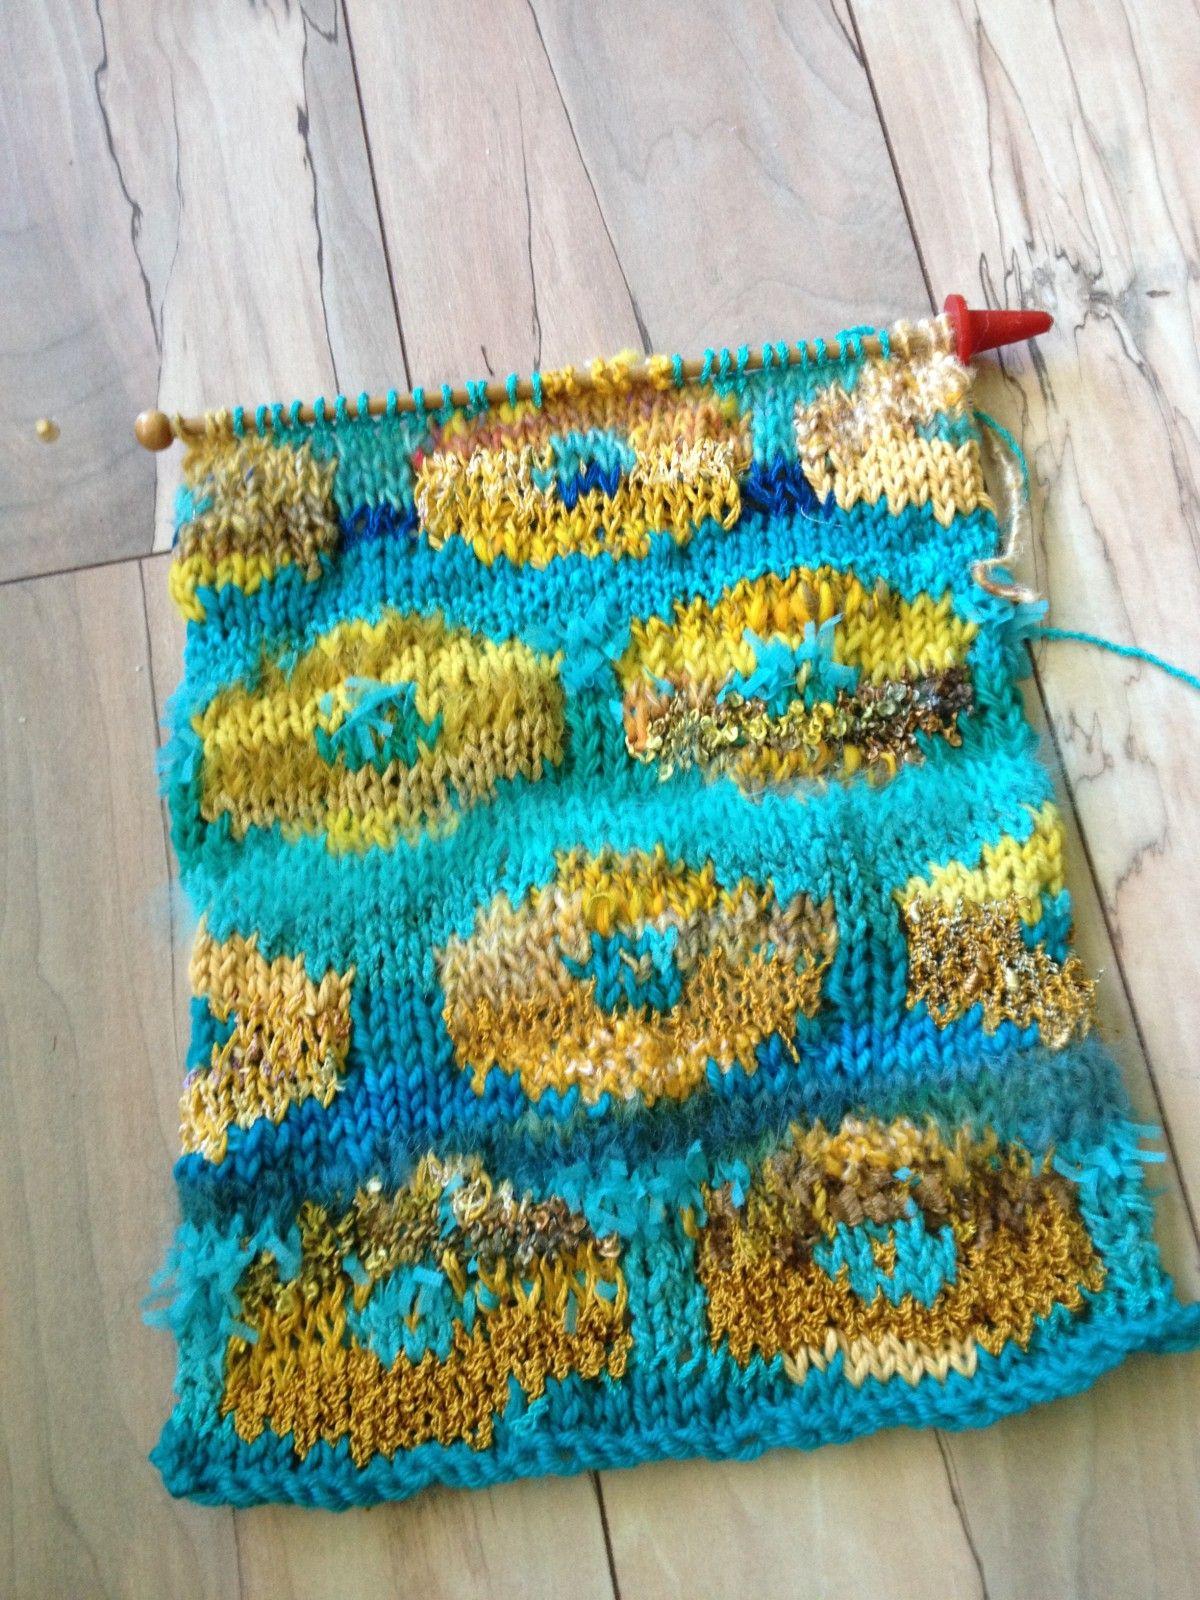 Pin by Cheri Pyles on Knitting Intarsia knitting